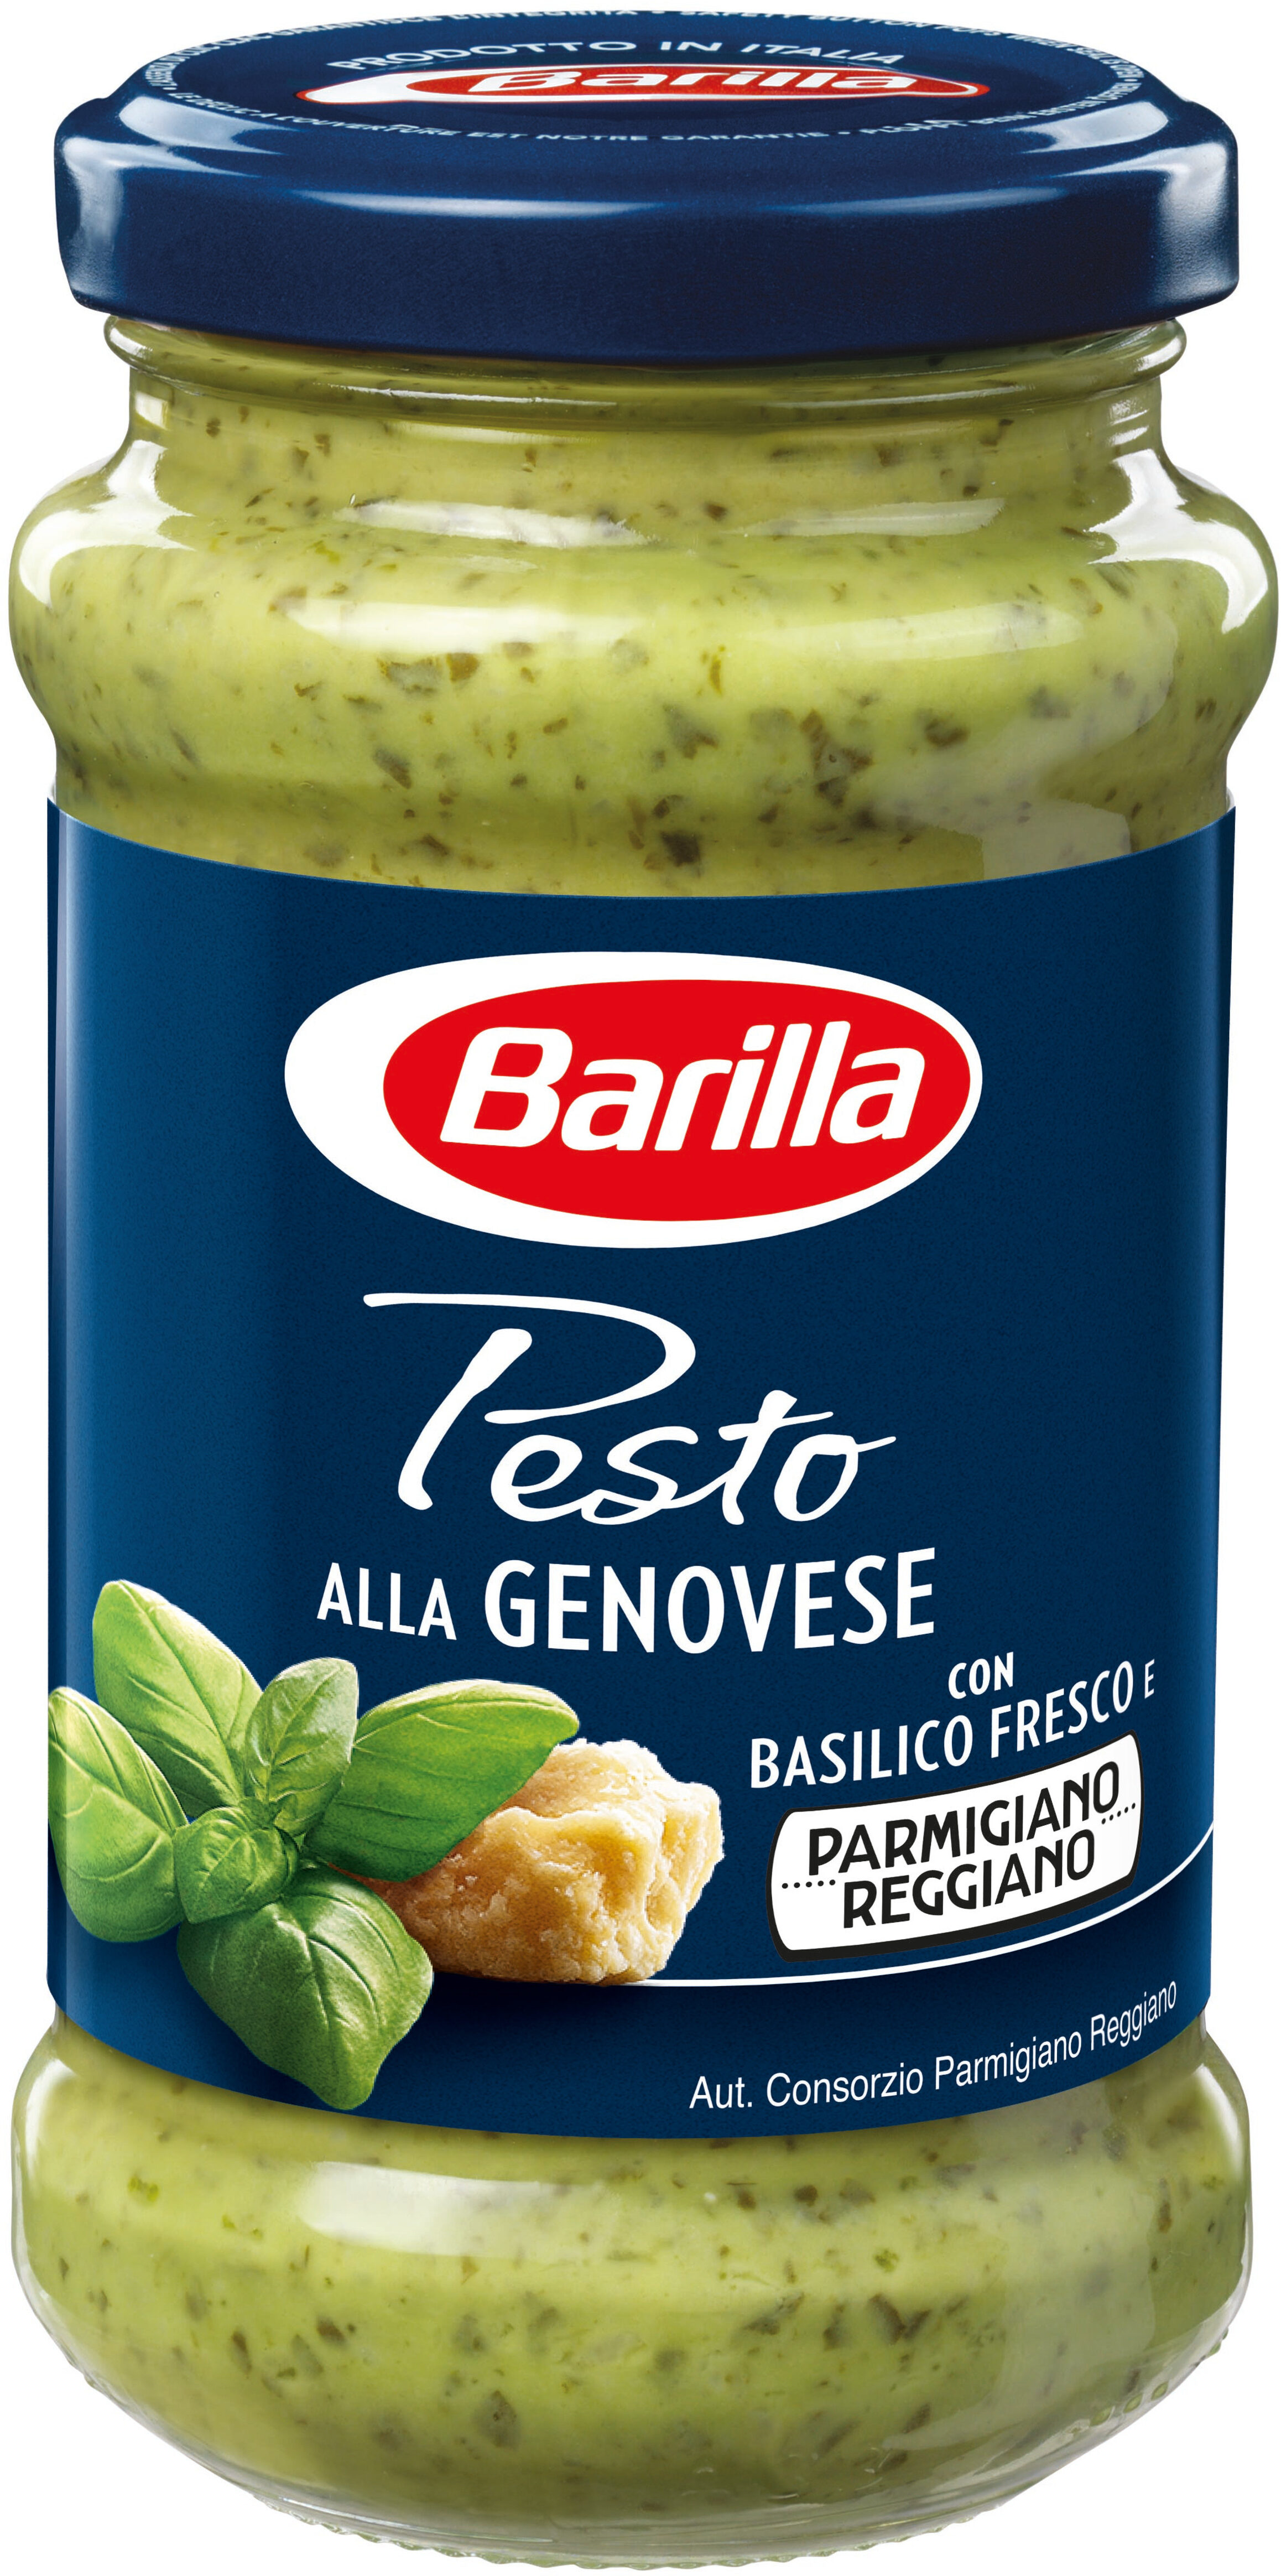 Barilla sauce pesto alla genovese basilic frais - Prodotto - fr